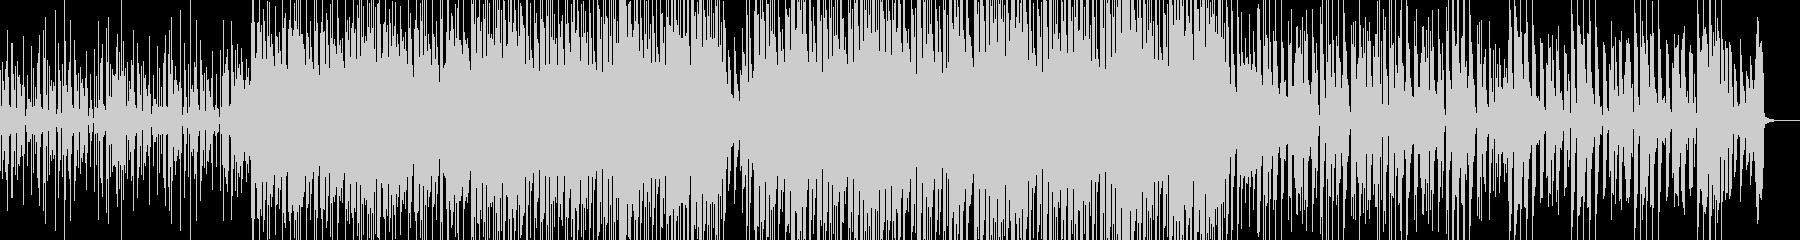 Calm deep house's unreproduced waveform